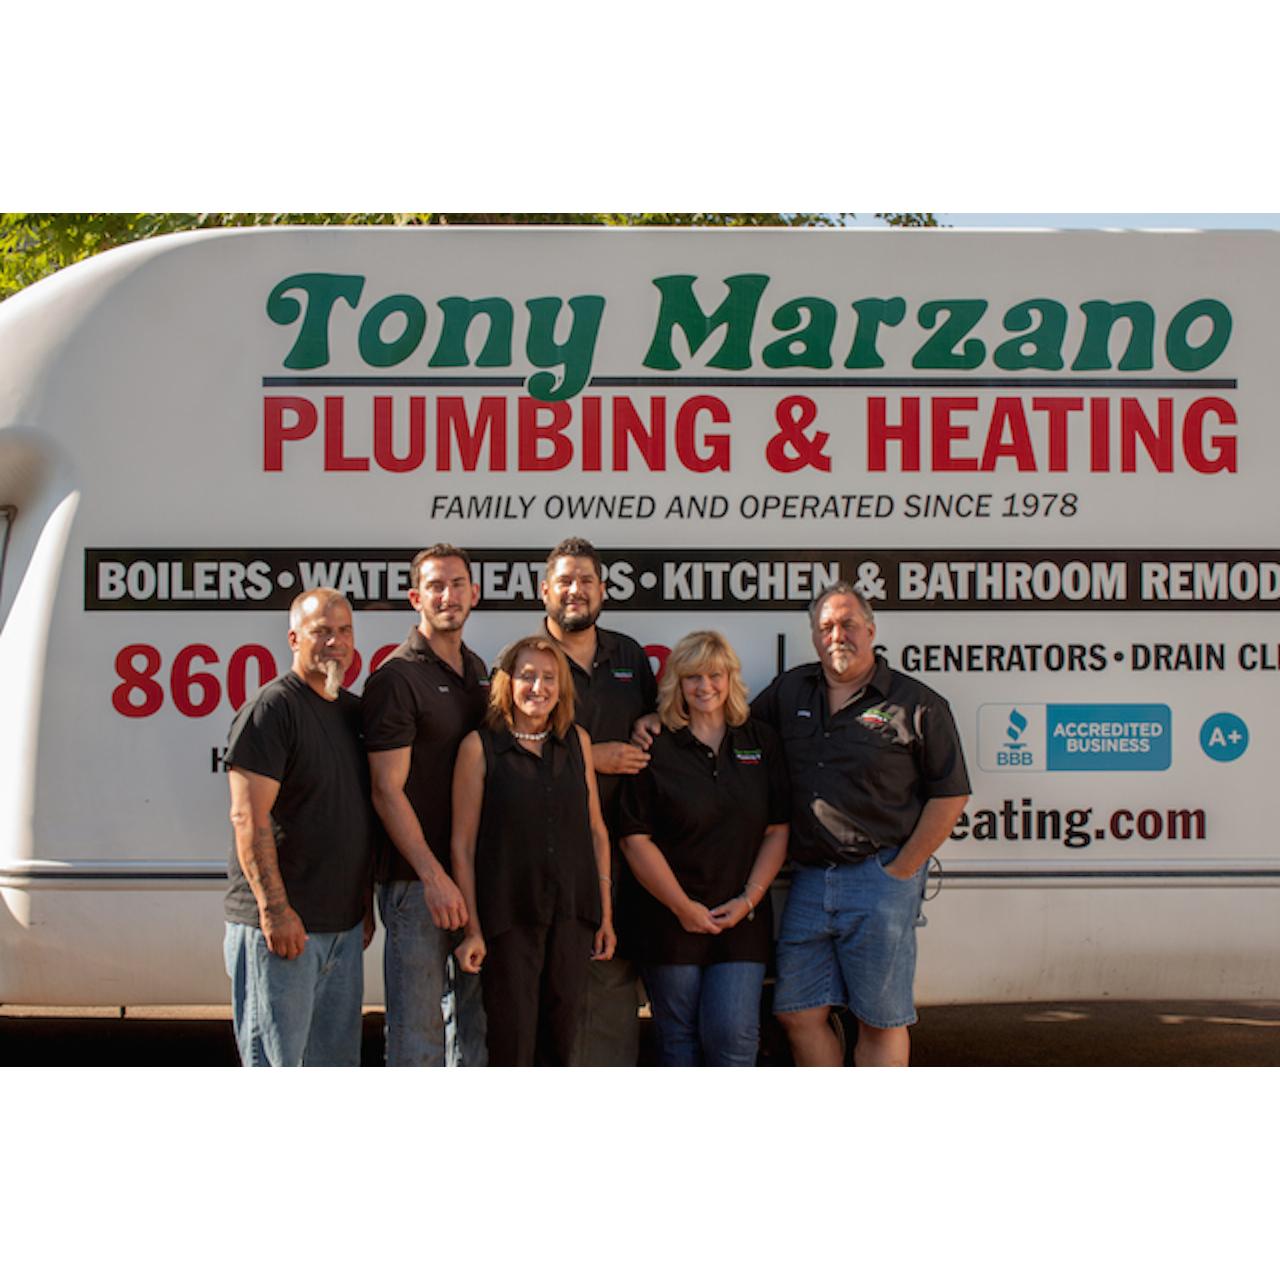 Tony Marzano Plumbing, Heating & Air Conditioning Co. Inc